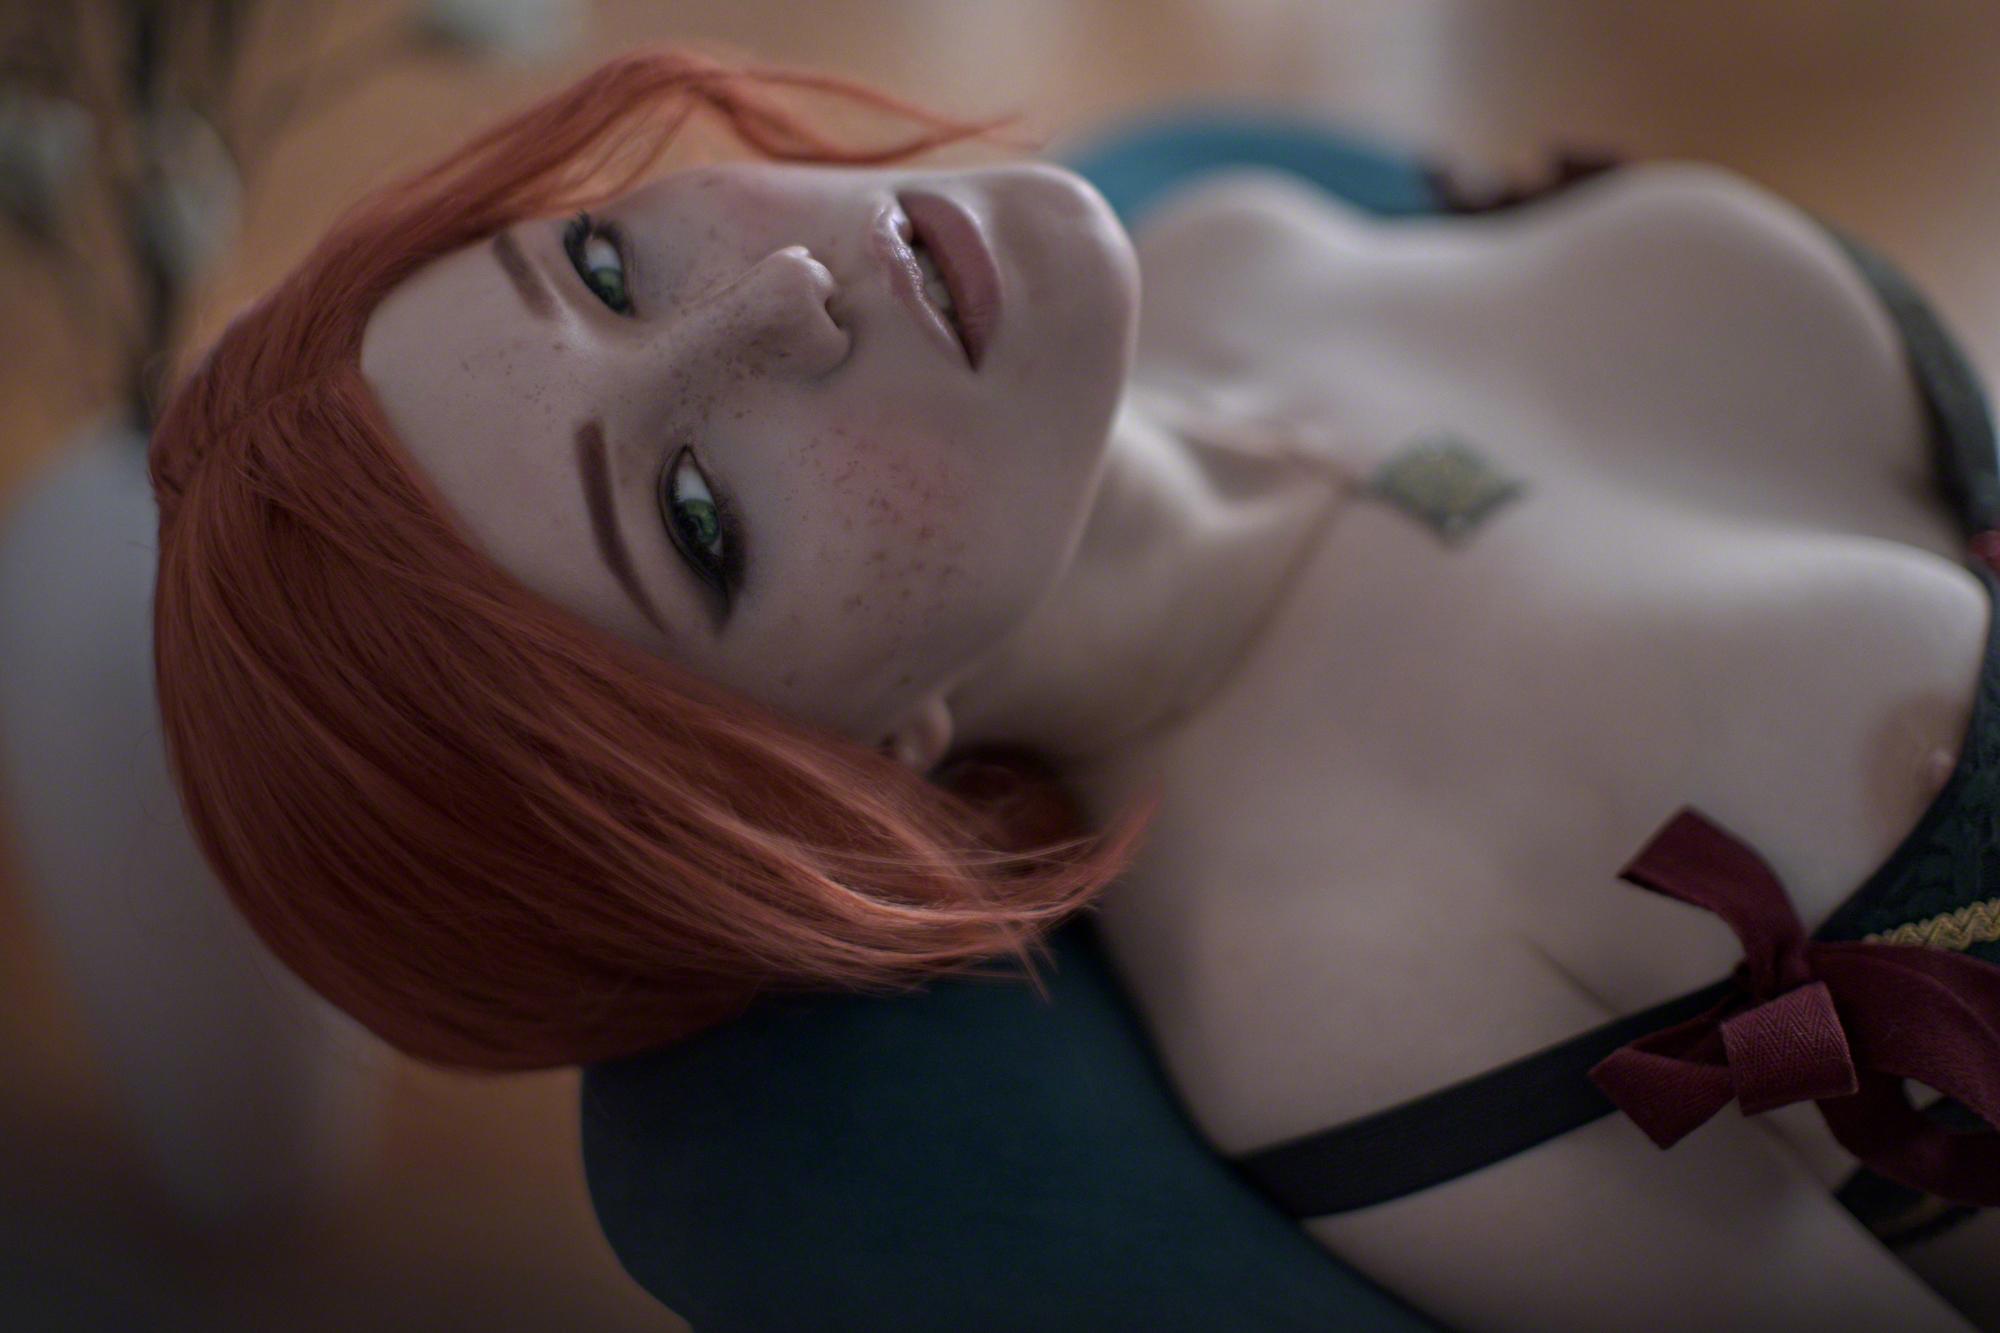 Leaked Nude Set From Lada Lyumos Patreon 0015